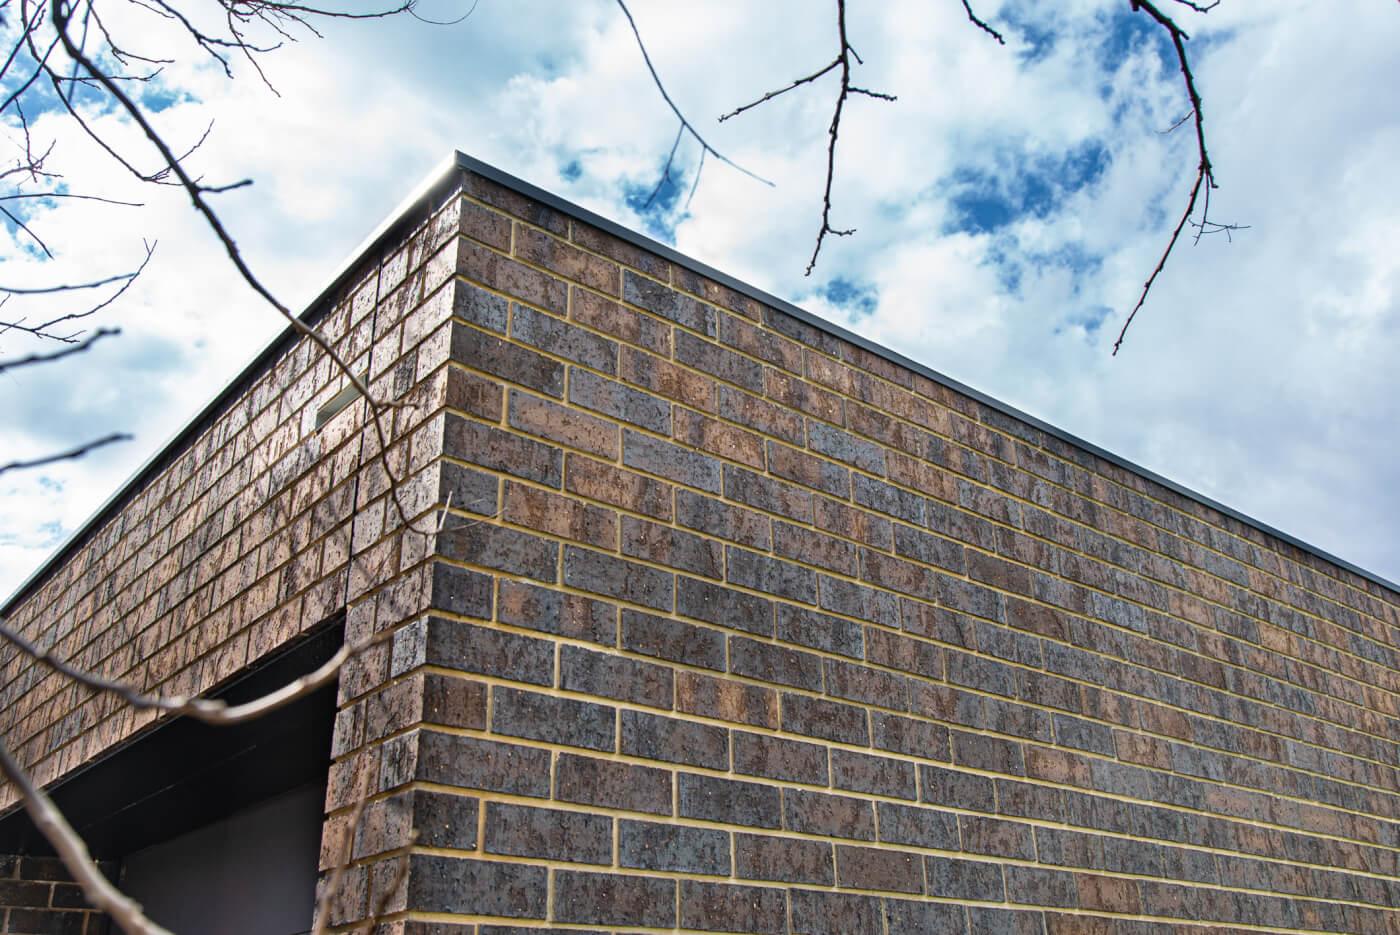 Coachhouse Brick 76mm Hyde Park Littlehampon Bricks And Pavers Reduced 2